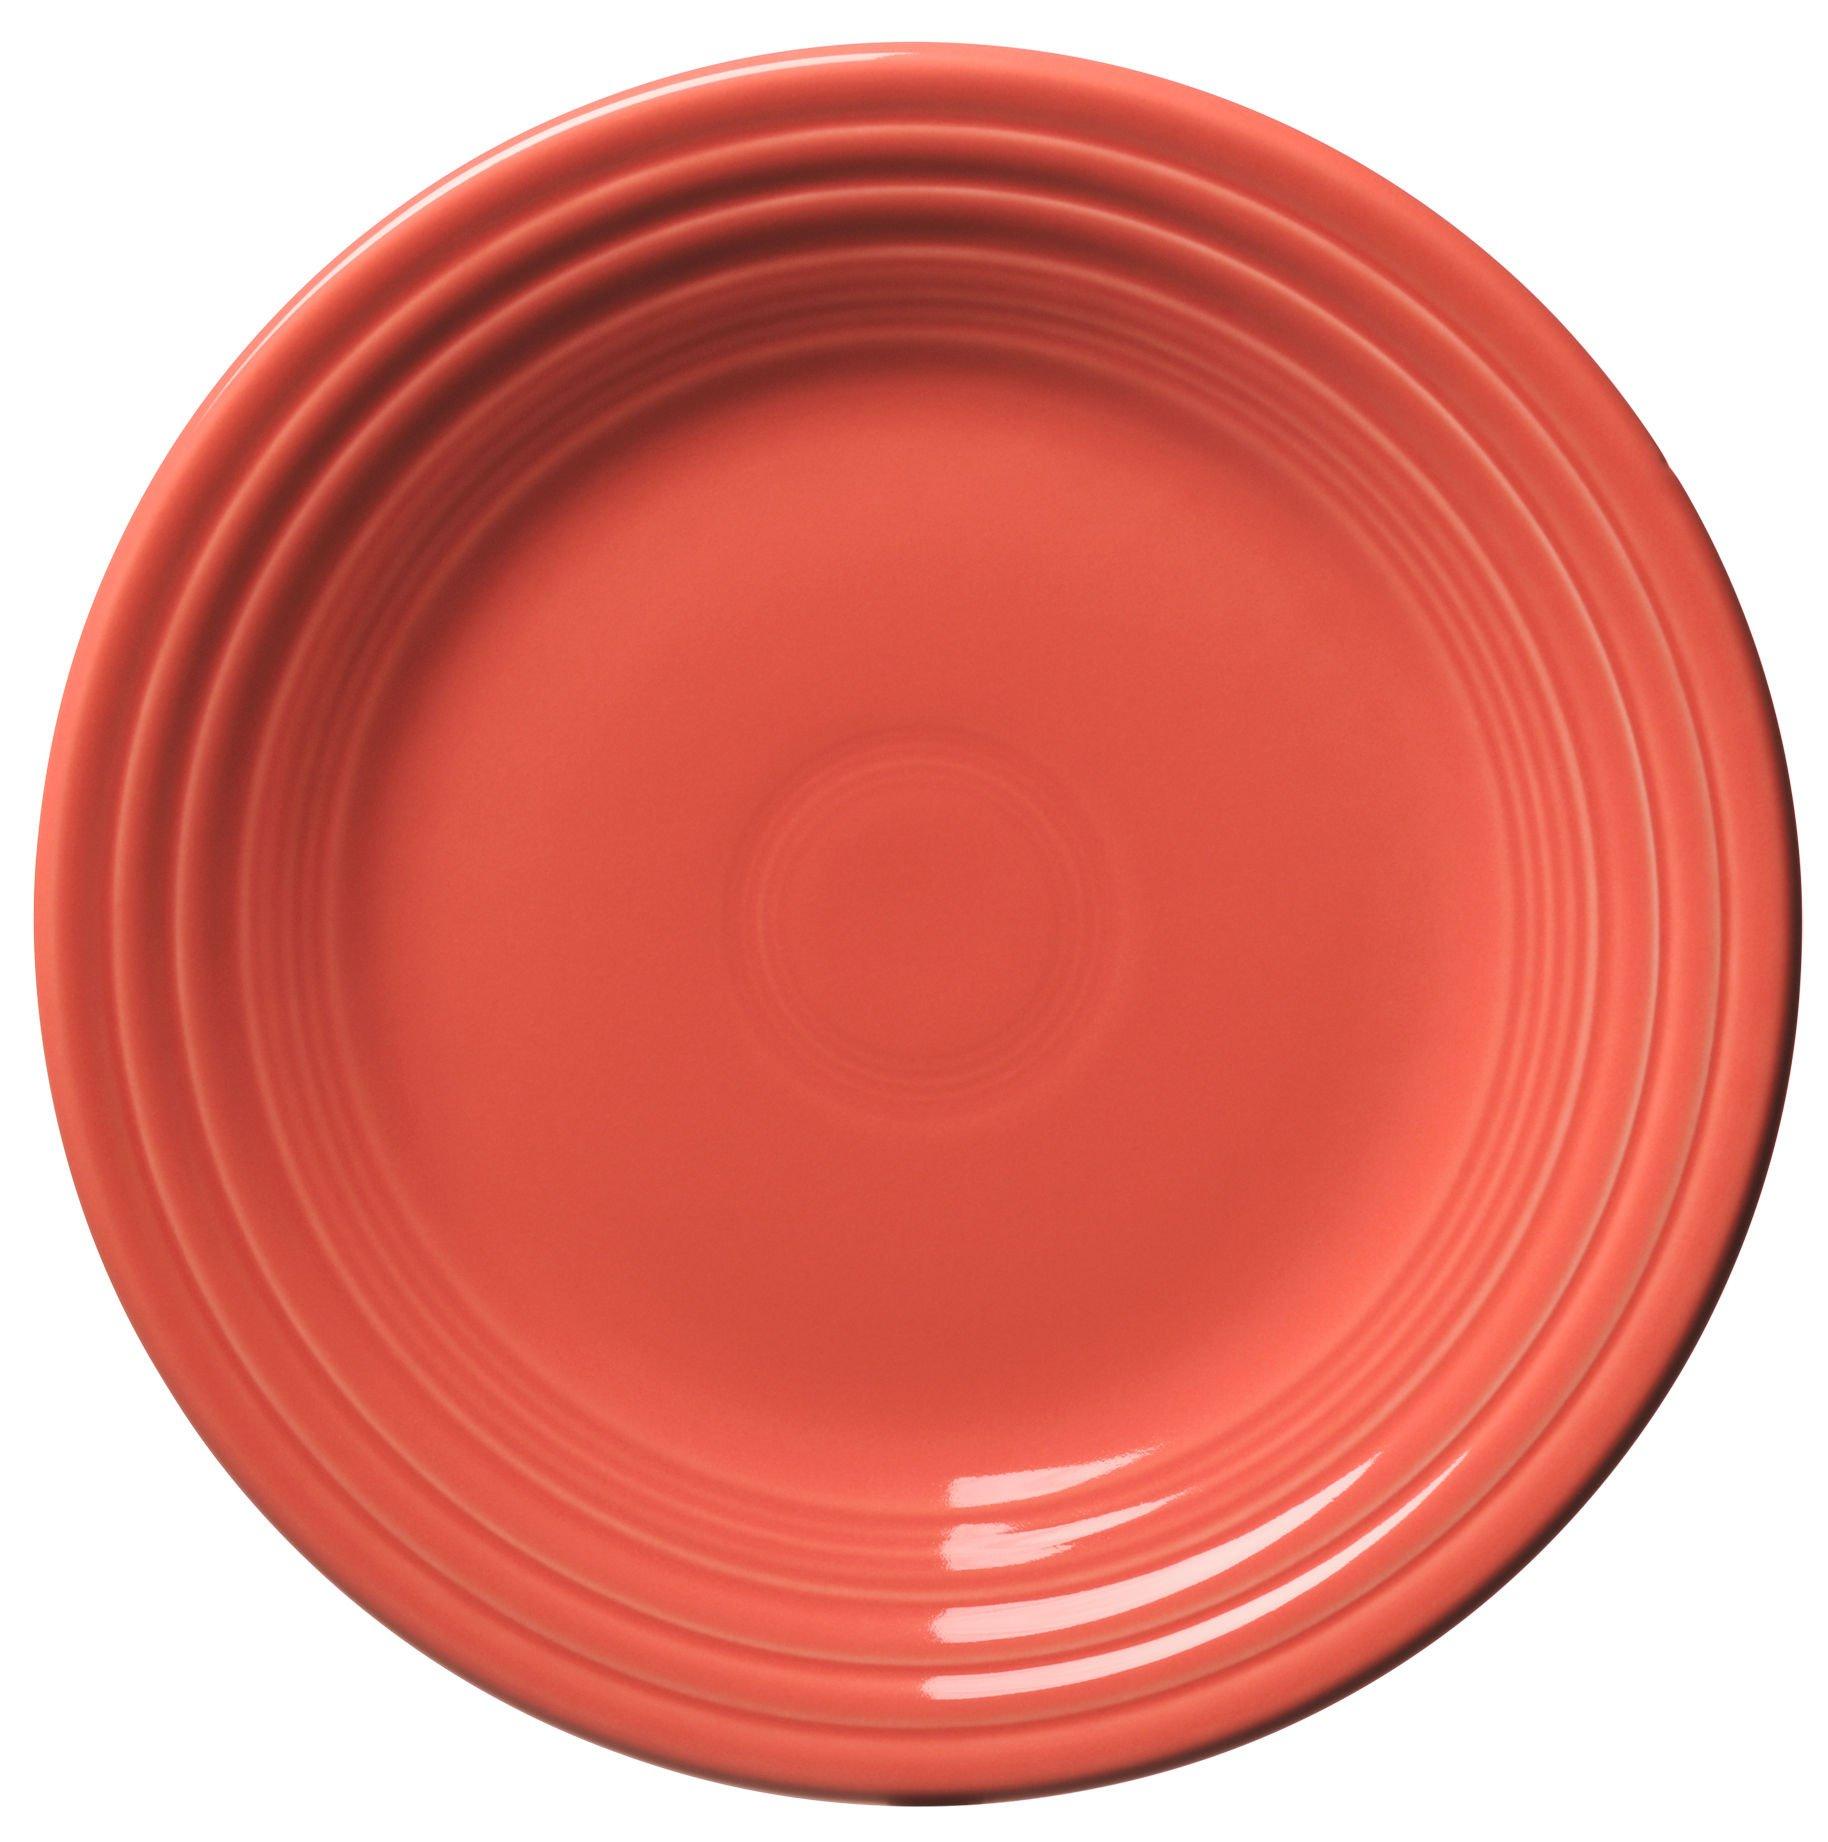 Fiesta 9-Inch Luncheon Plate, Flamingo